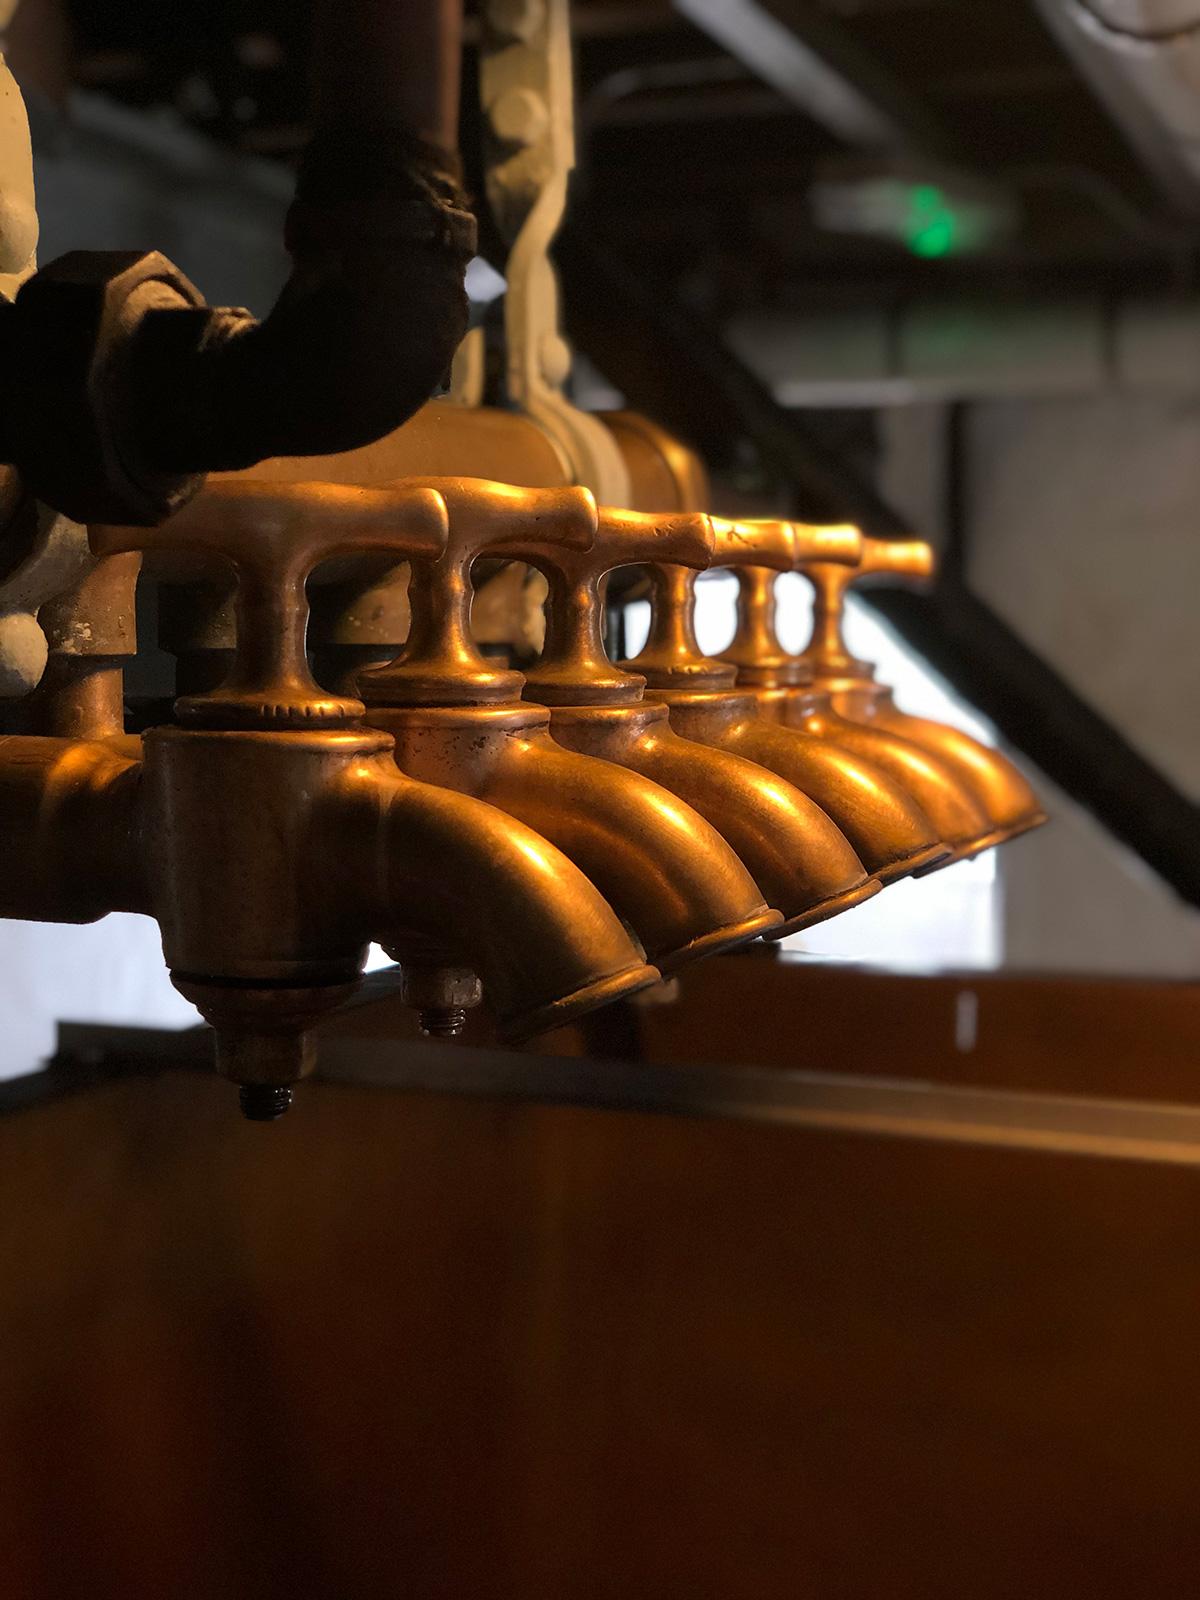 Brewing taps